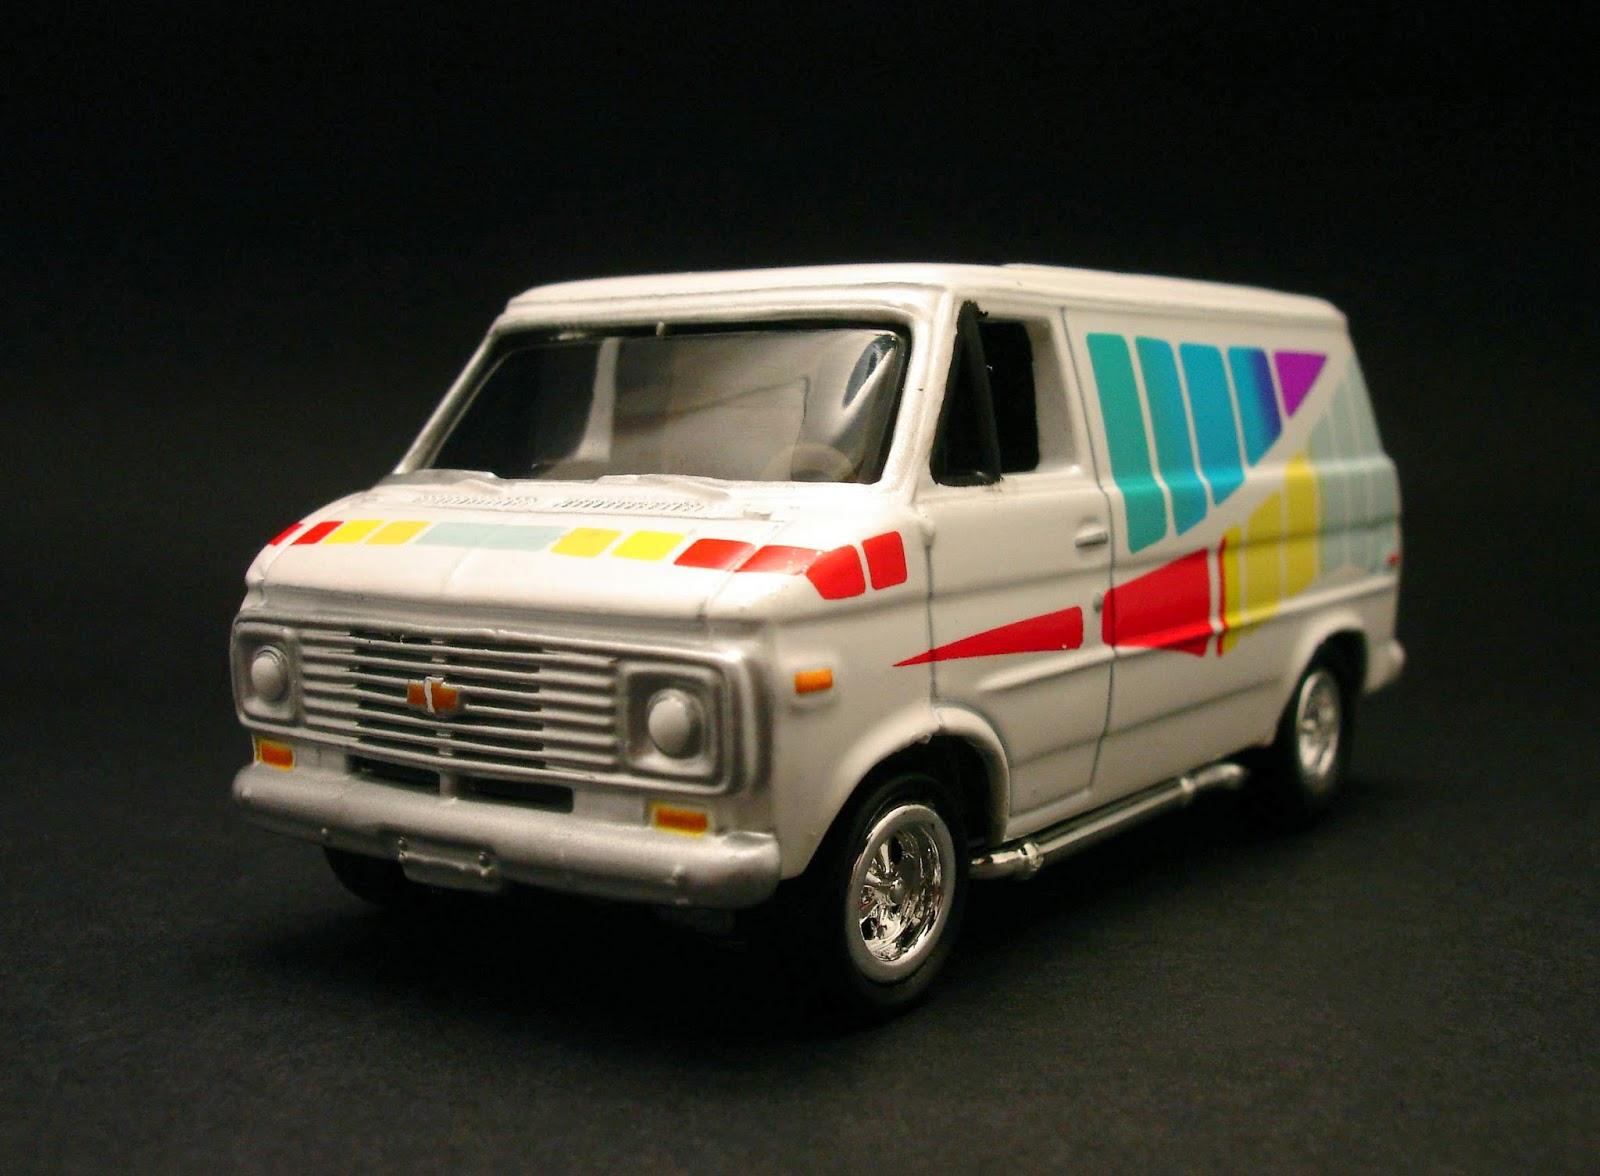 ad253b27cb62b3 Diecast Hobbist  1976 Chevrolet G20 Van